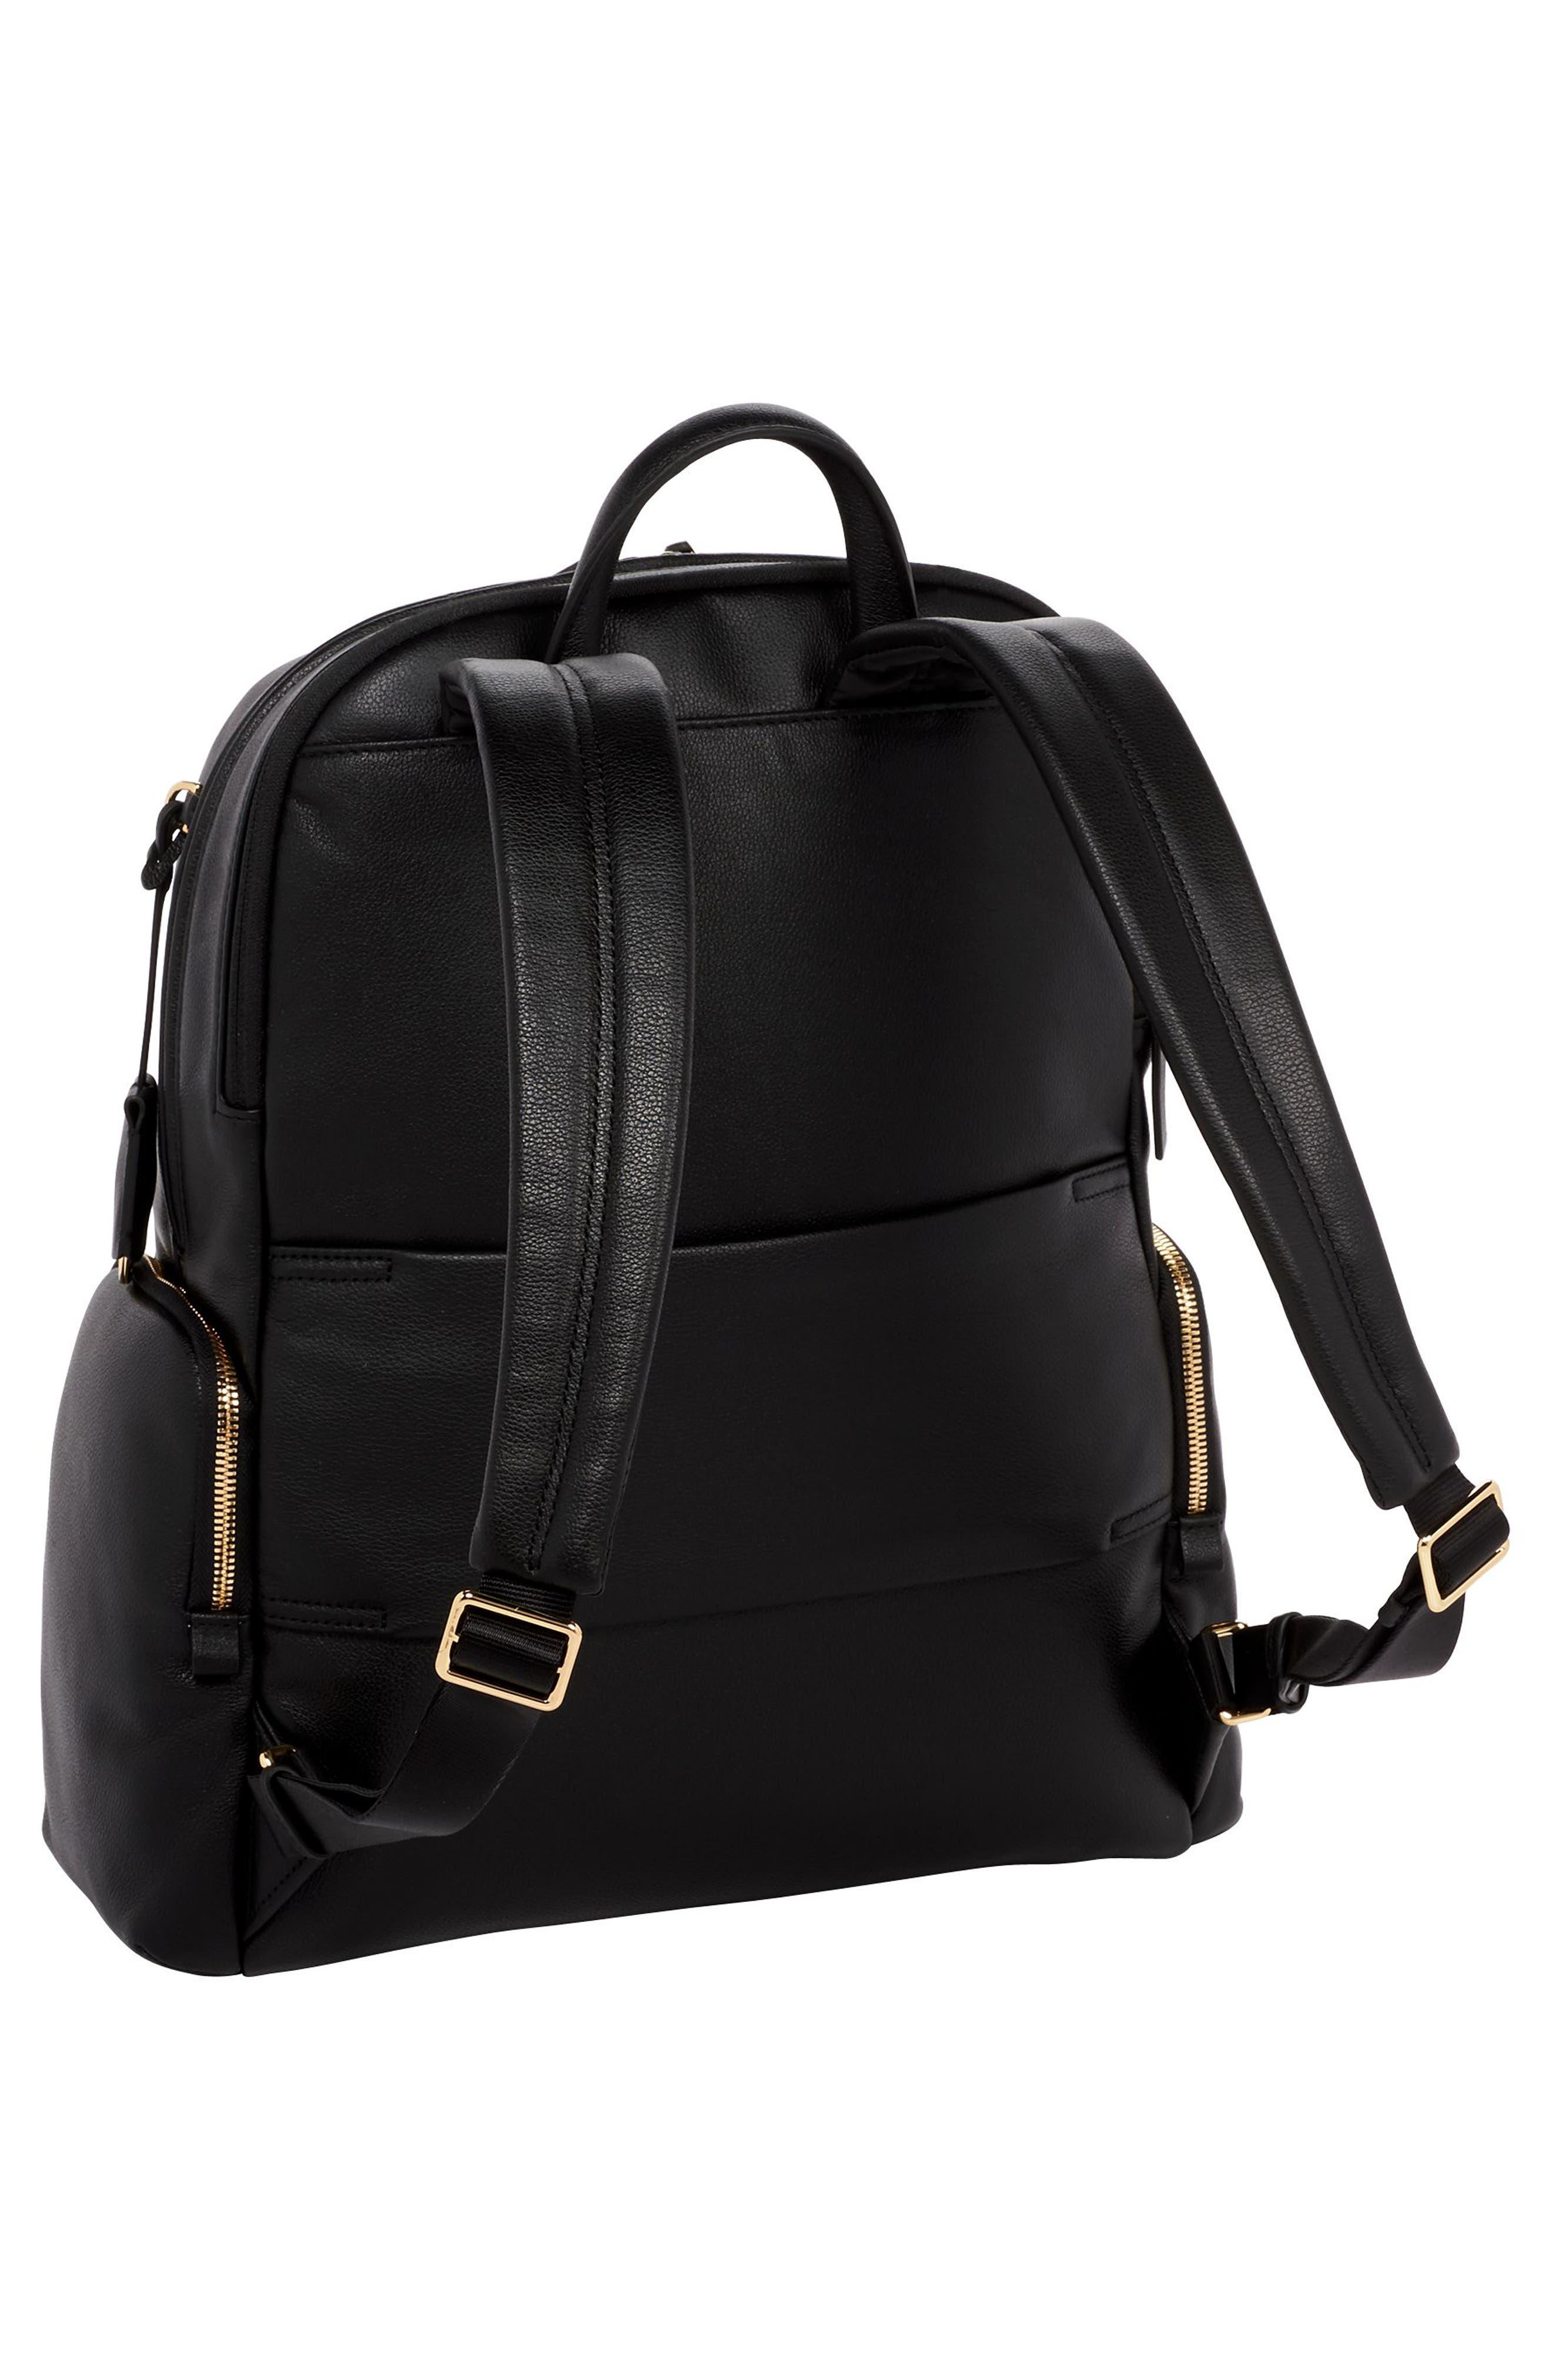 TUMI, Voyageur Carson Leather Backpack, Alternate thumbnail 3, color, BLACK